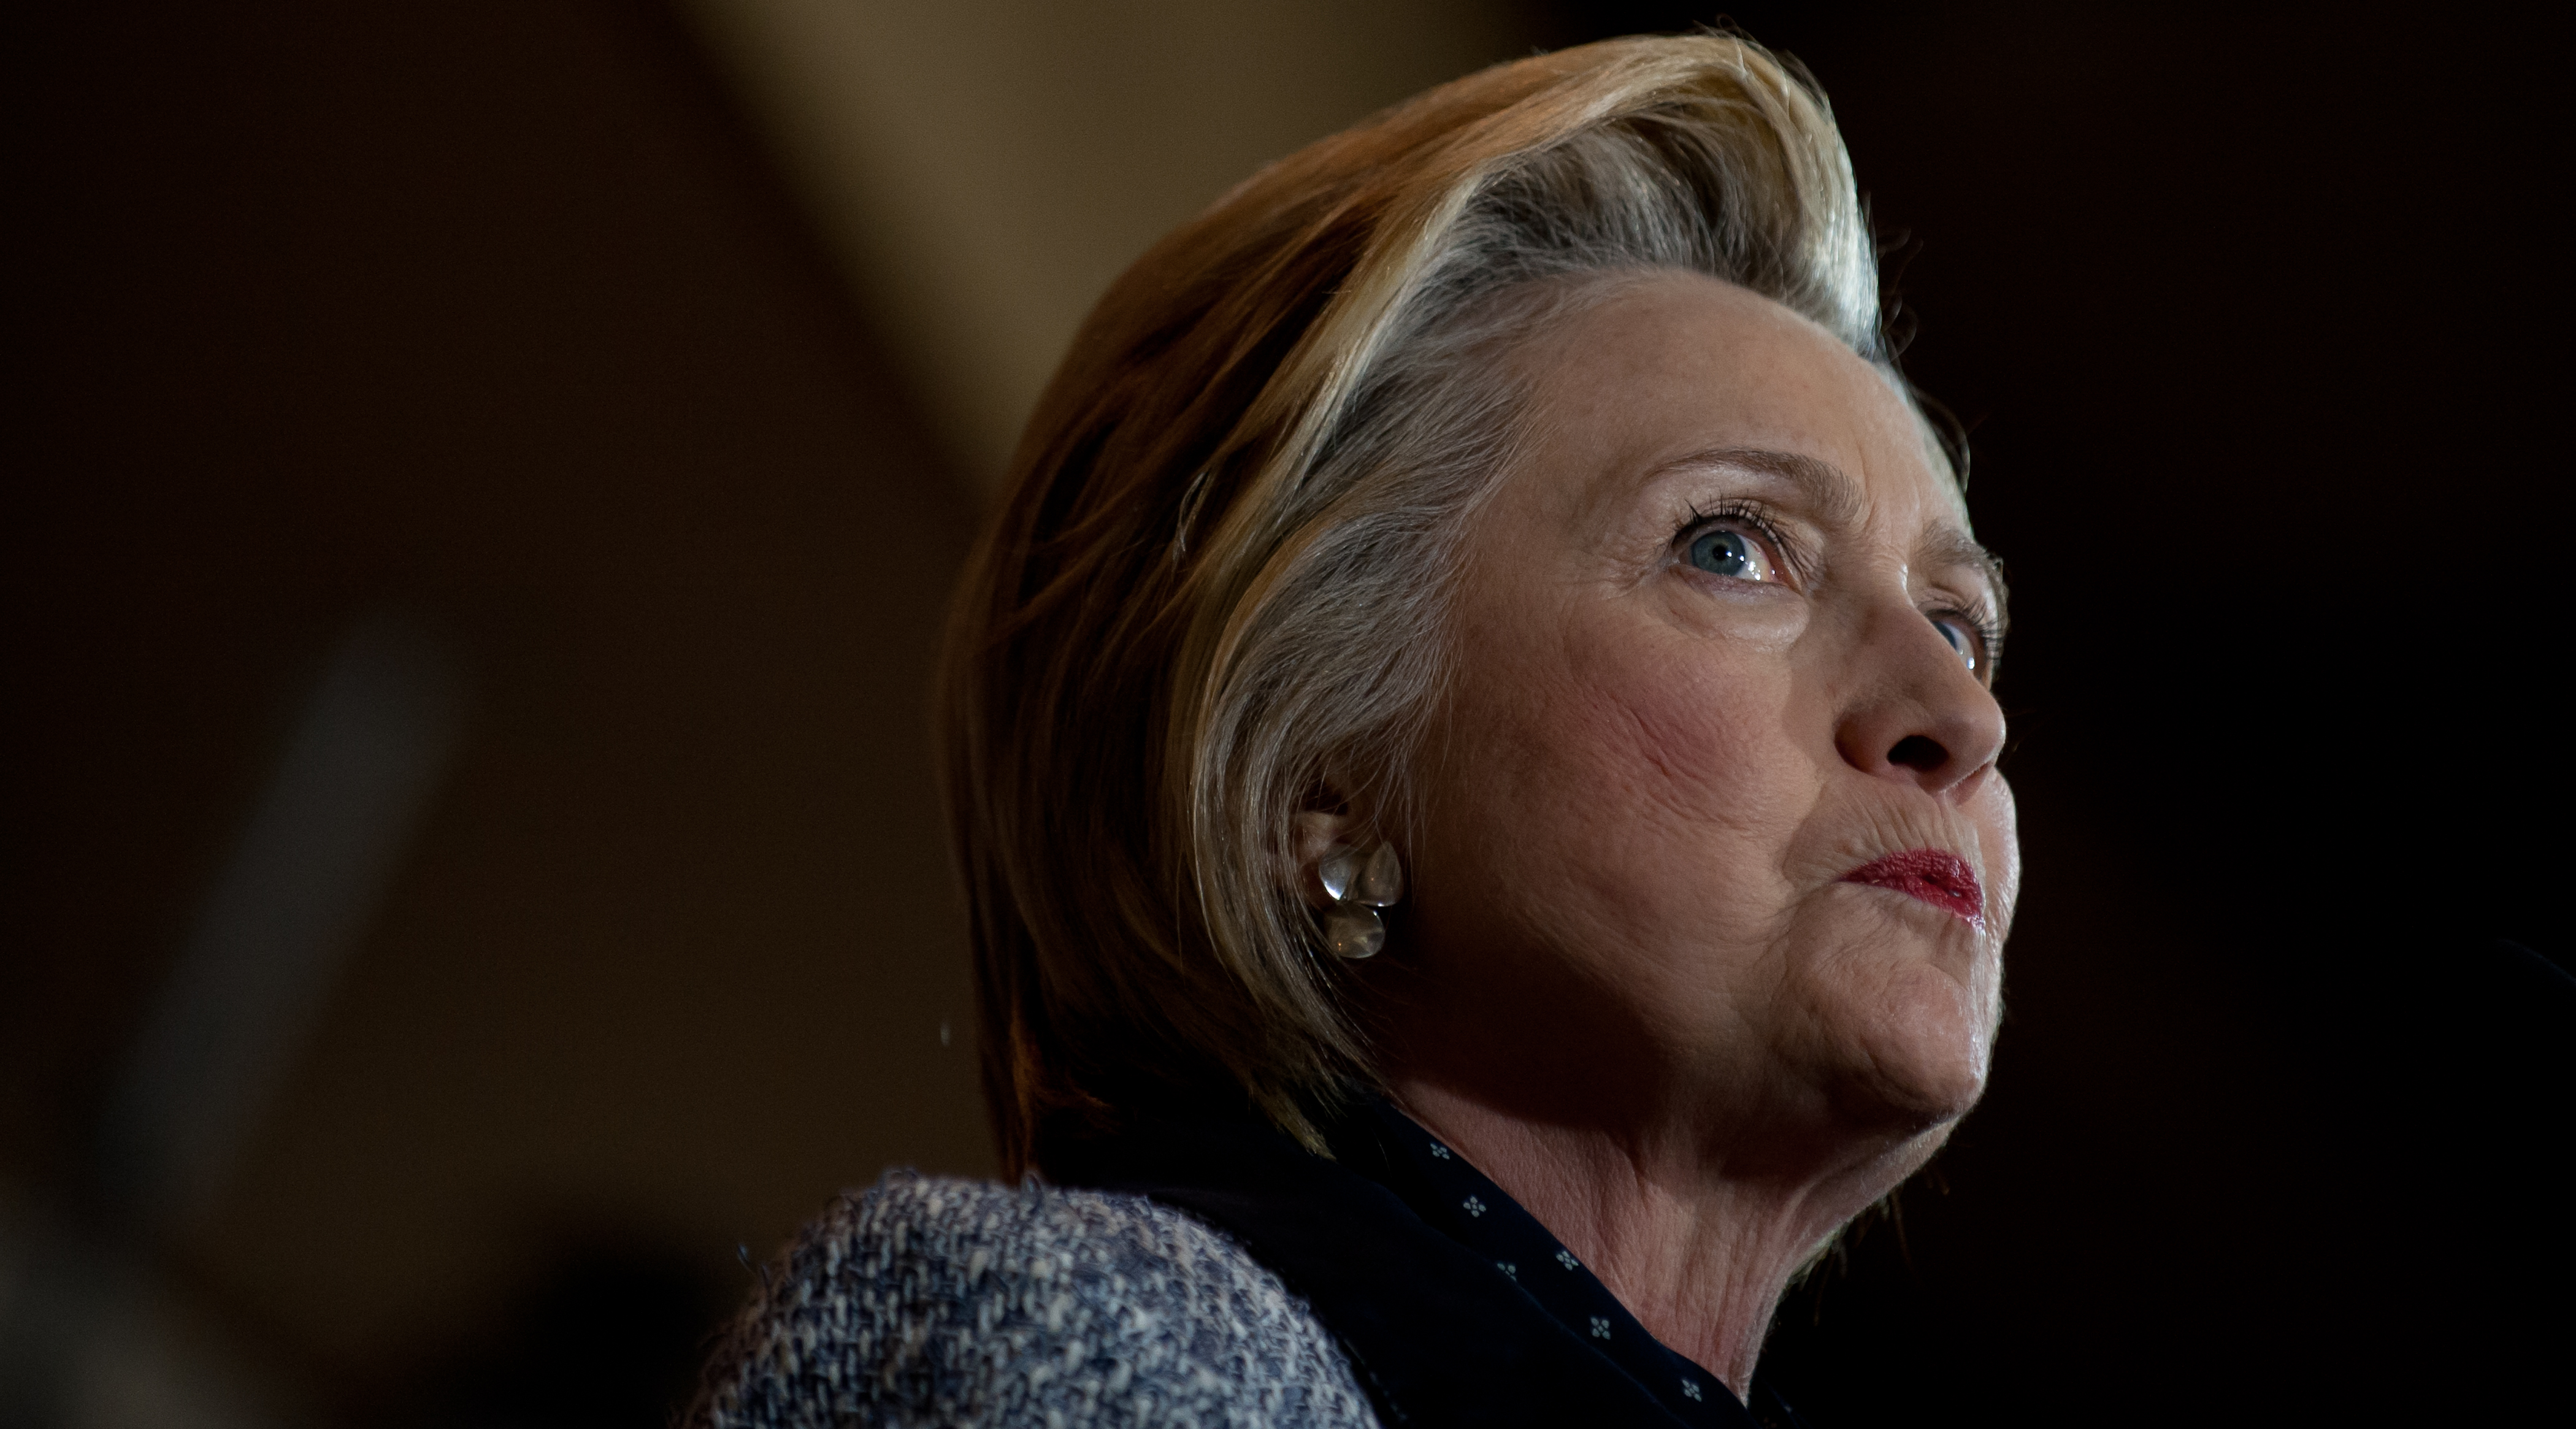 Presumptive Democratic Presidential Candidate Hillary Clinton Campaigns In Western Pennsylvania